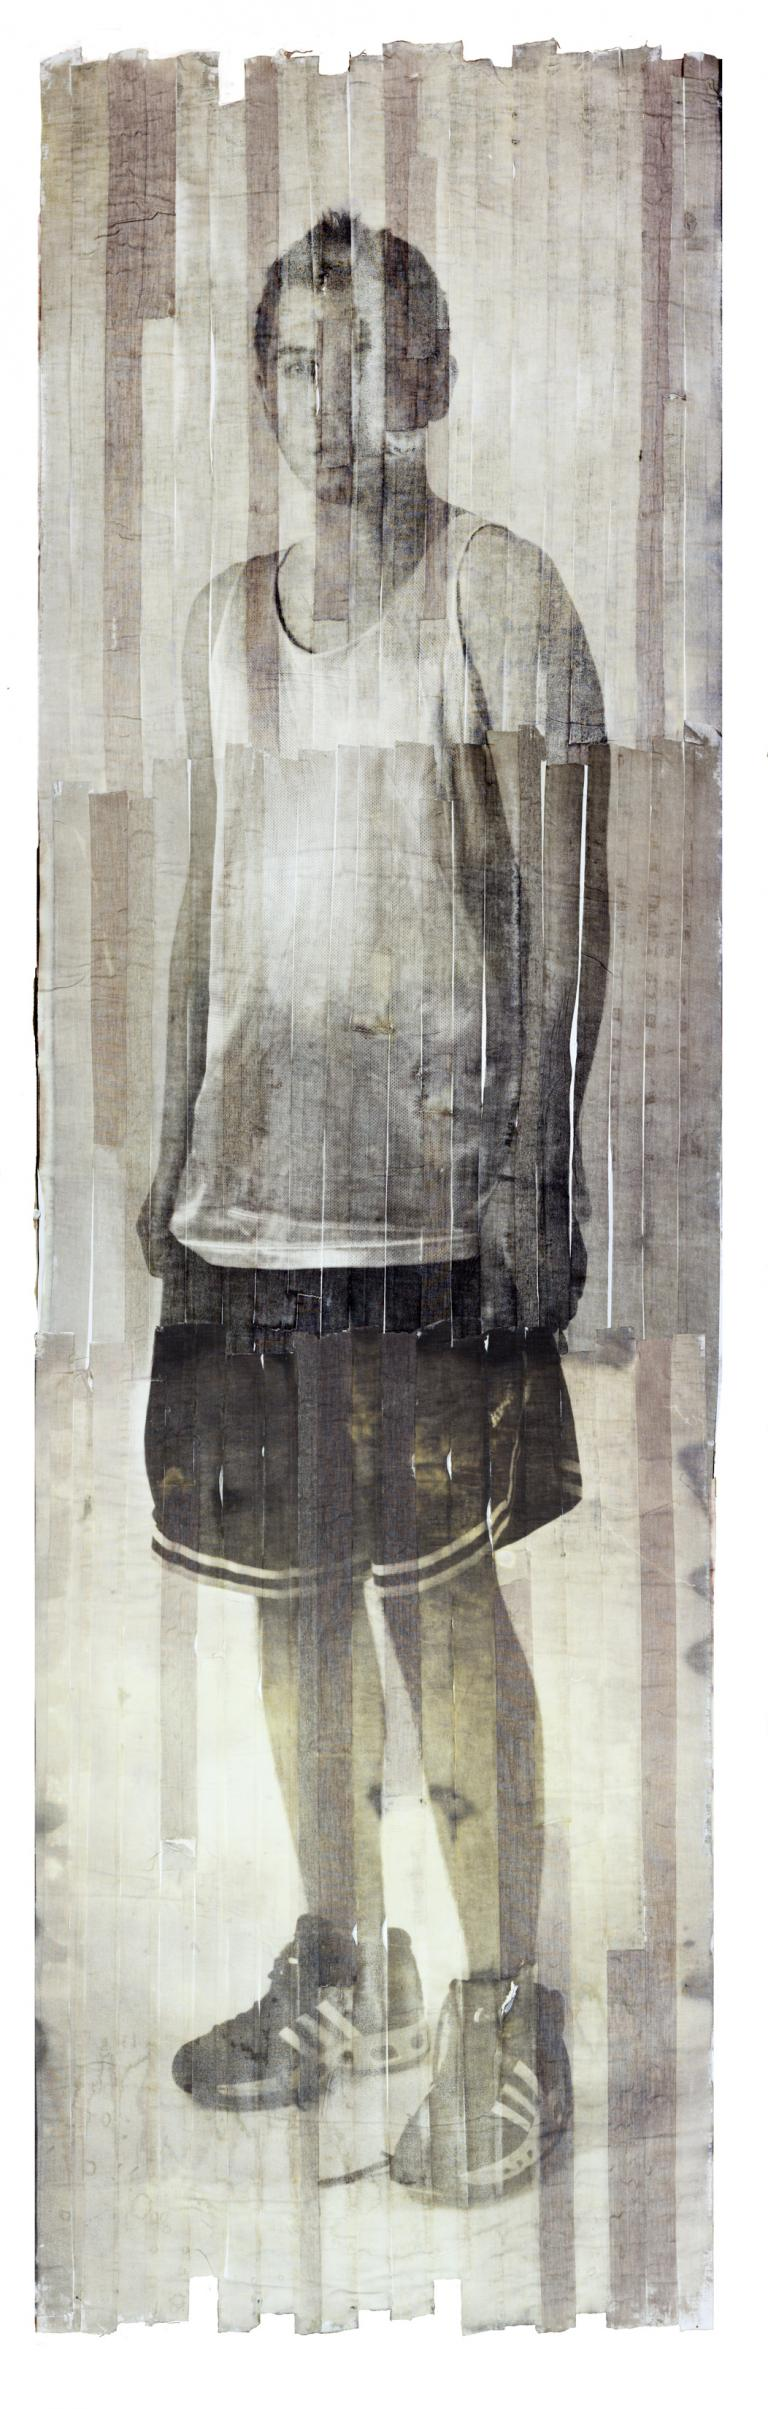 "Chadric Devin, ""Self Portrait,"" Van Dyke brown print on athletic tape, 82 x 24"", 2013."